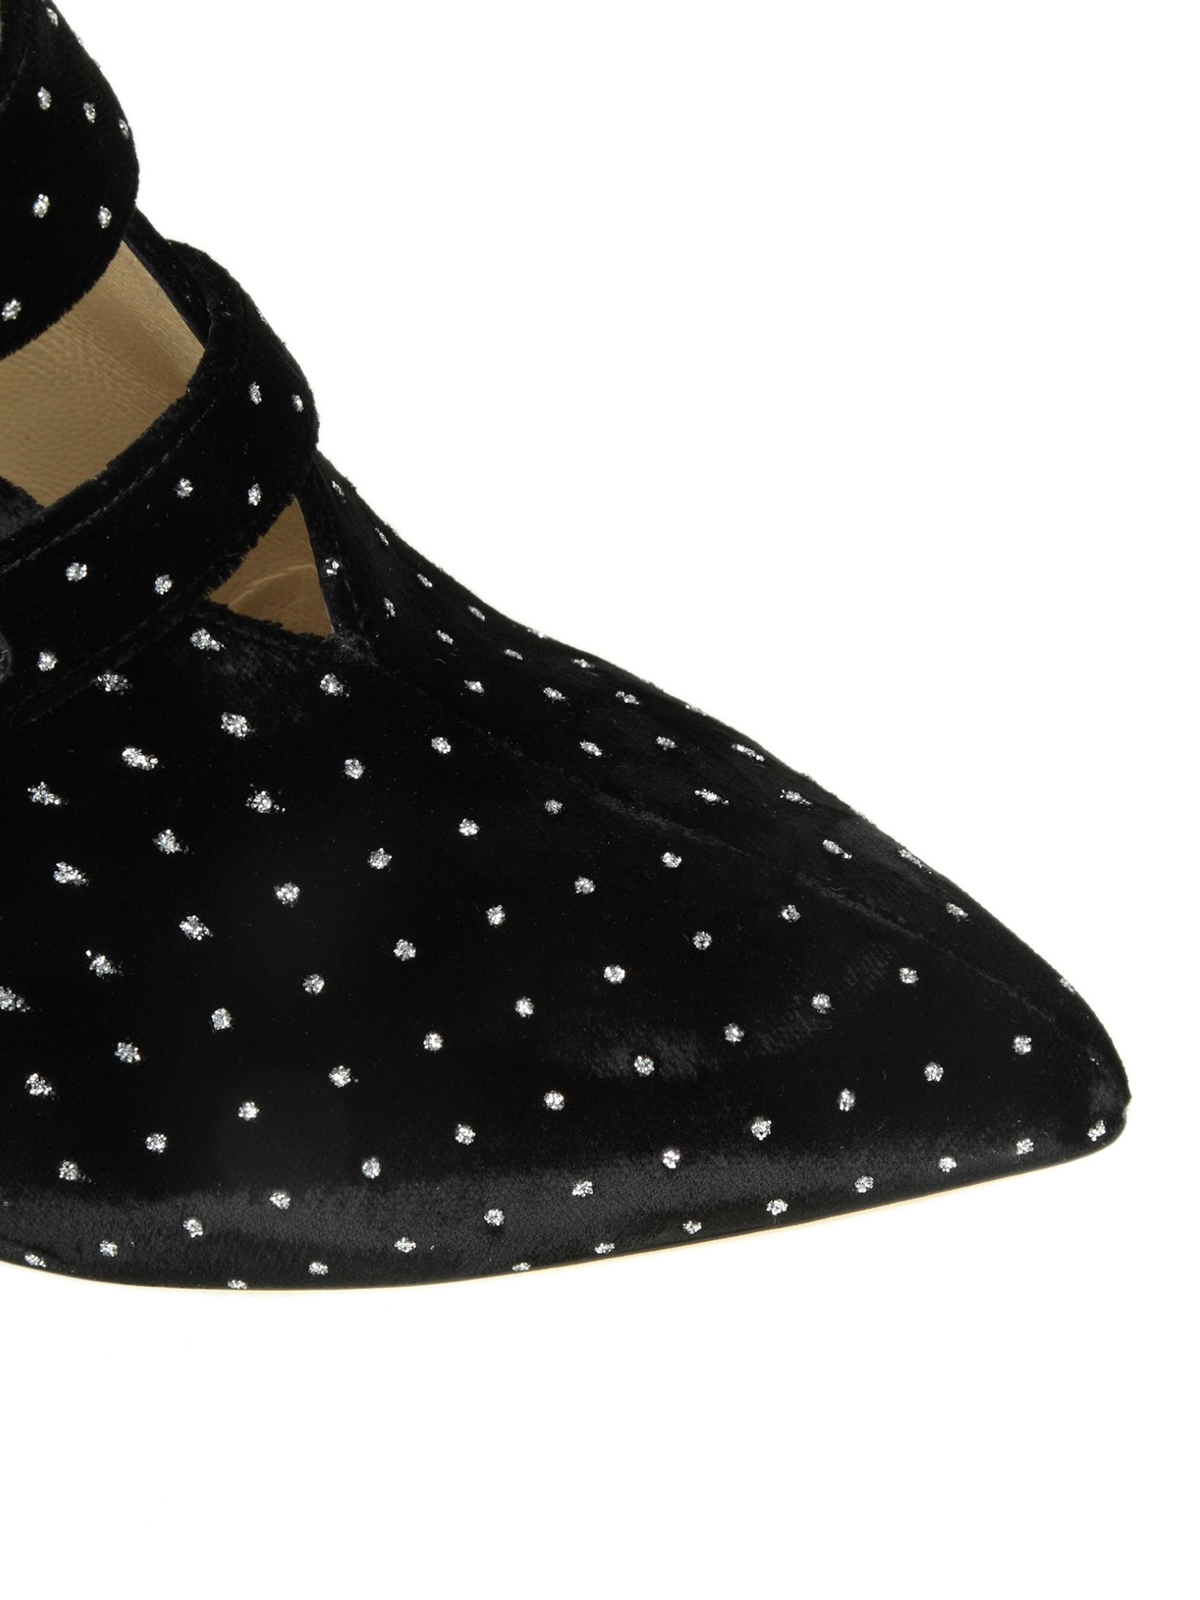 e1f82d23232 iKRIX JIMMY CHOO  ankle boots - Larissa 100 glitter spotted velvet booties